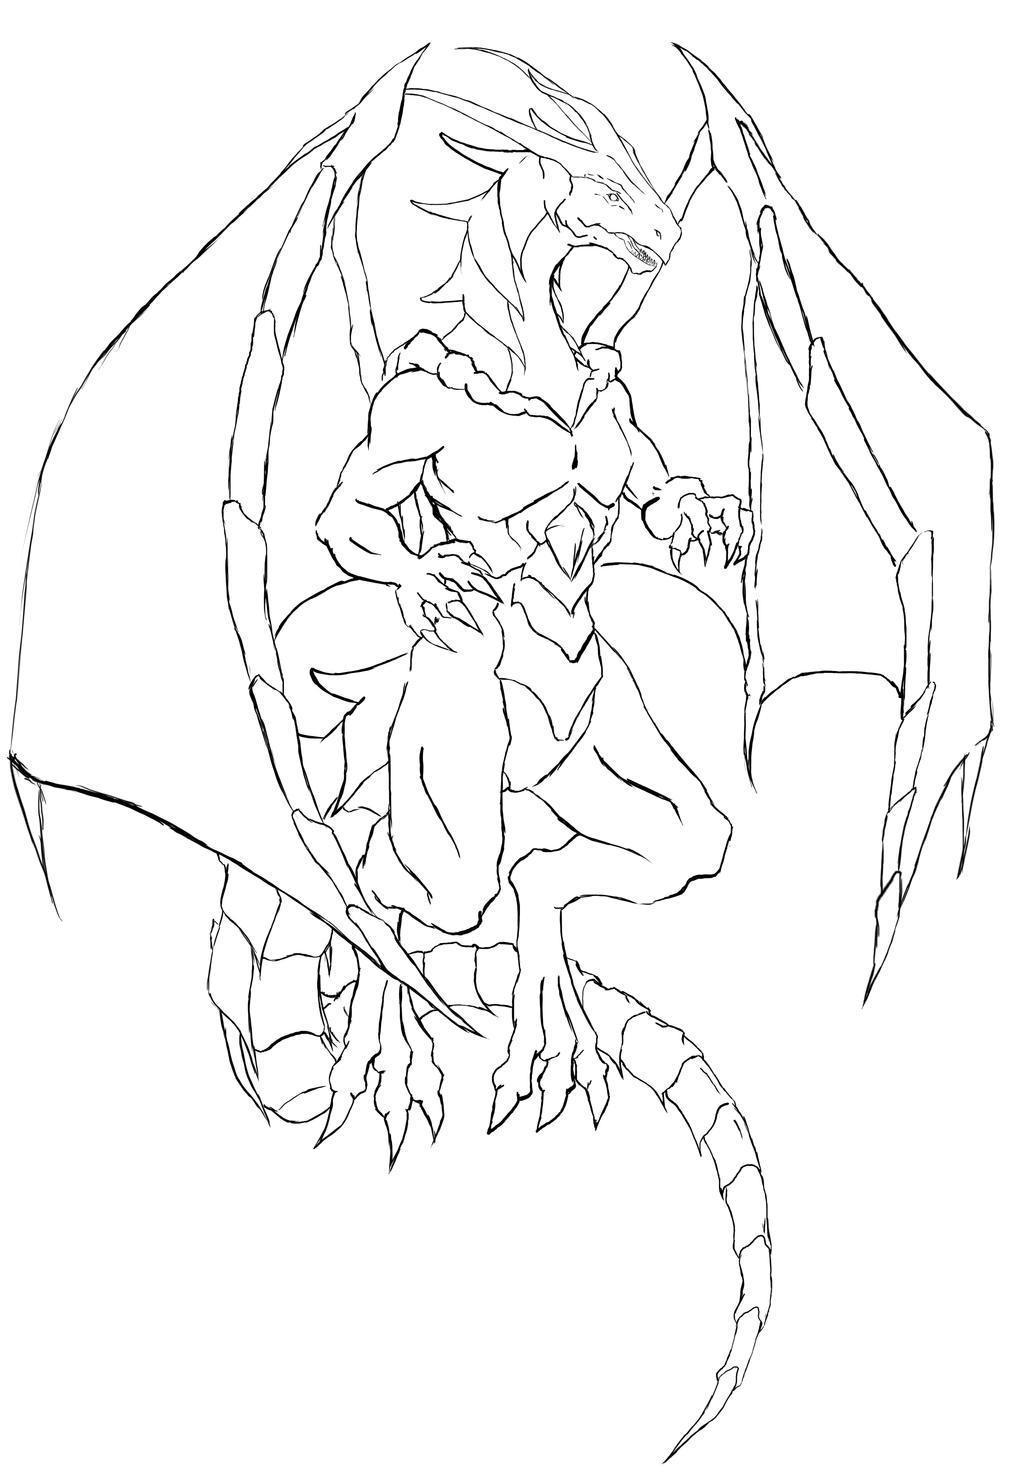 Dragon Outline By Heongaiden On Deviantart